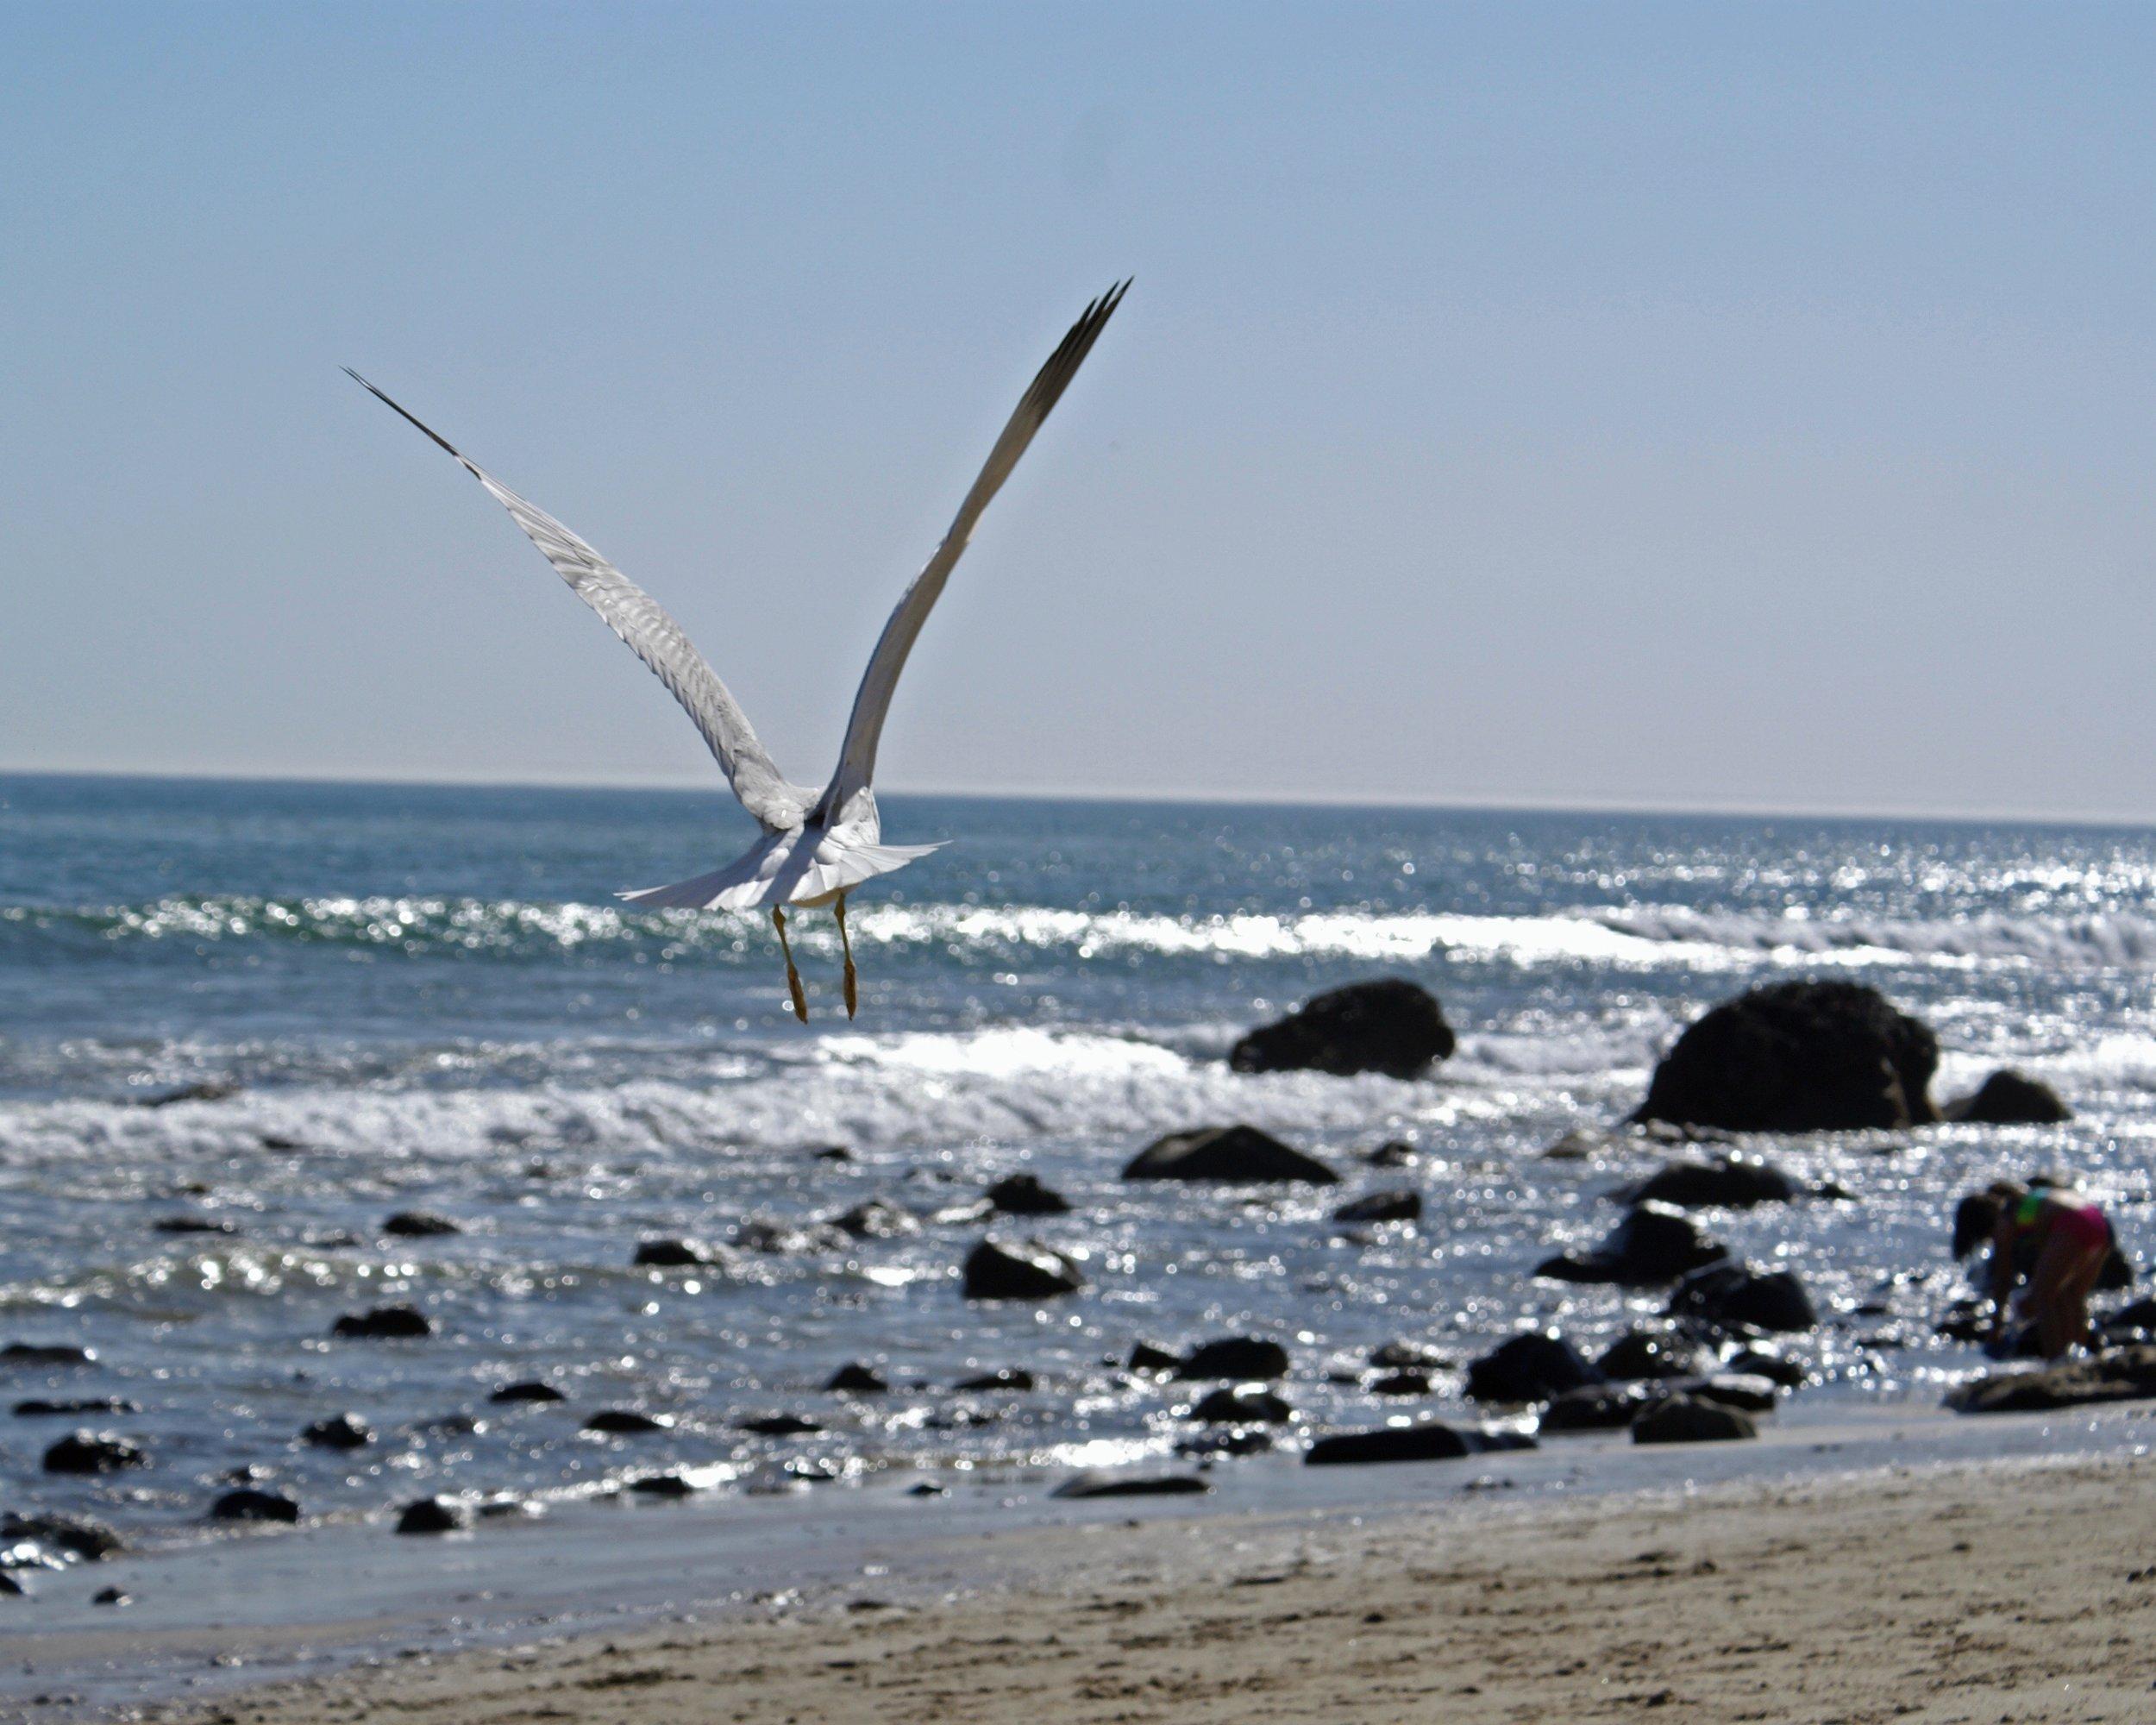 Bird Seagull 1.8MB DSC08989.JPG cropped copy.jpg